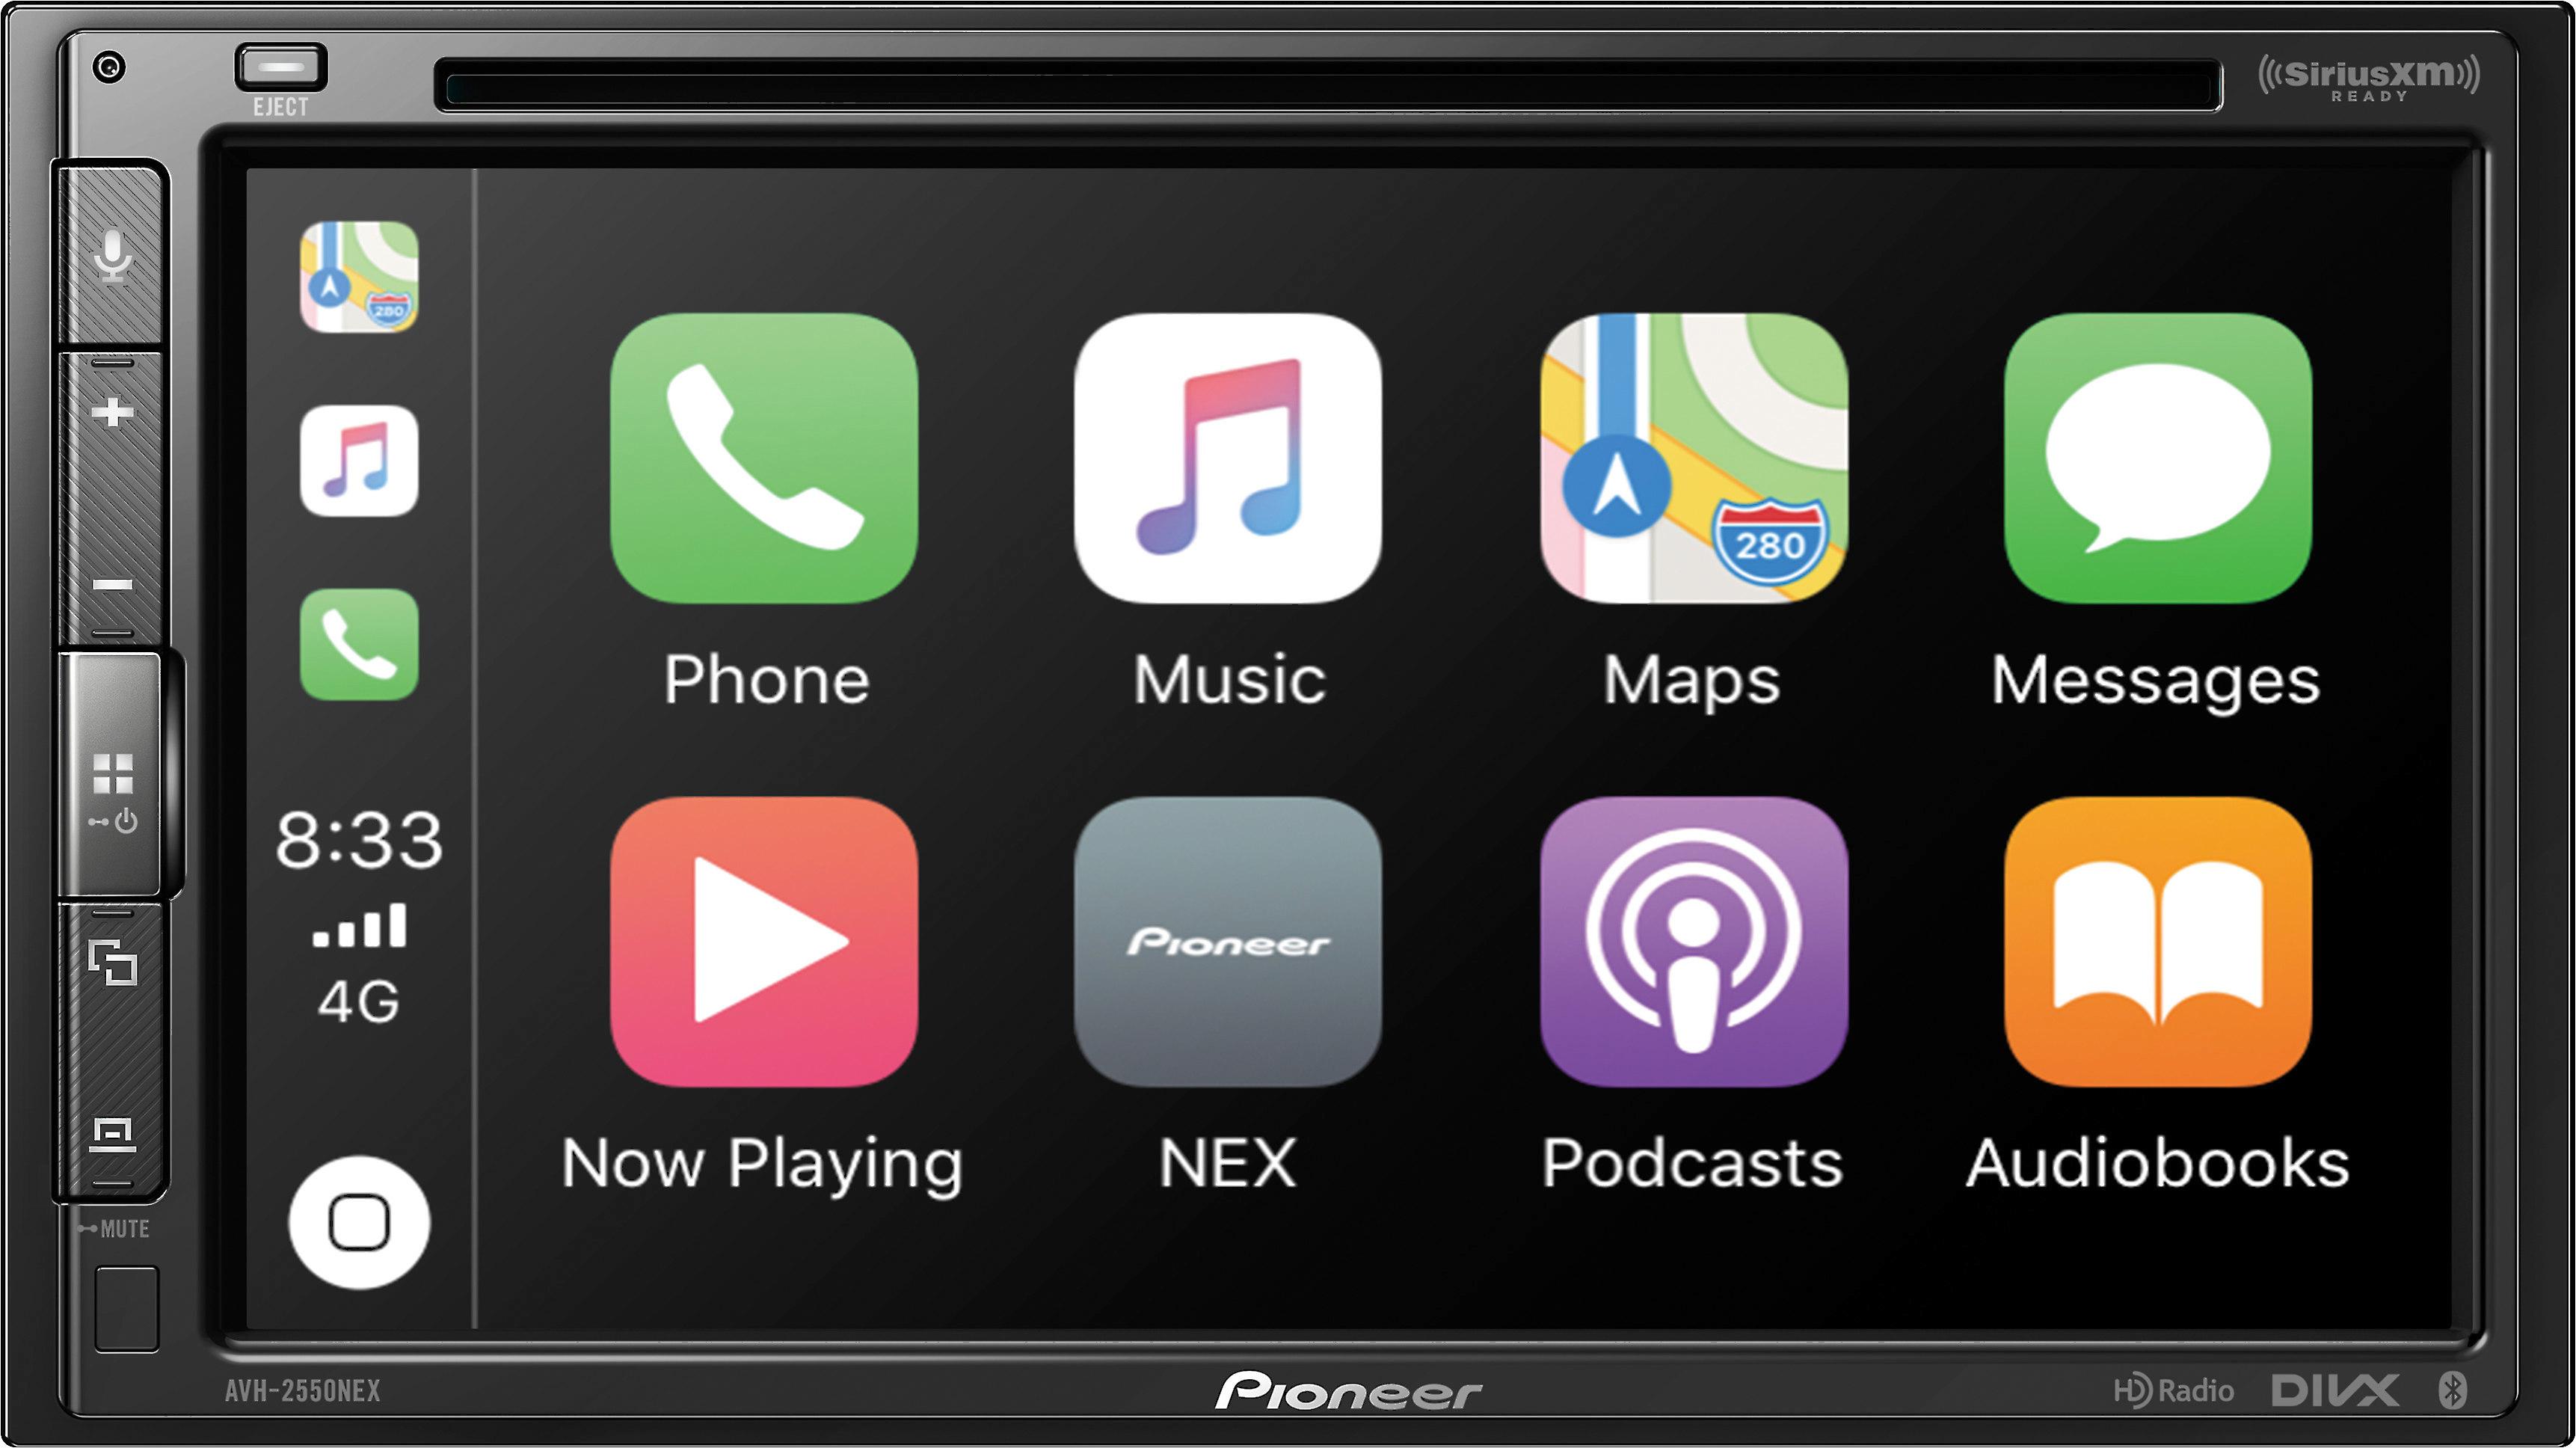 Replacement Remote Control for Pioneer AVH-291BT AVH-1550NEX AVH-1500NEX Car Audio Receiver